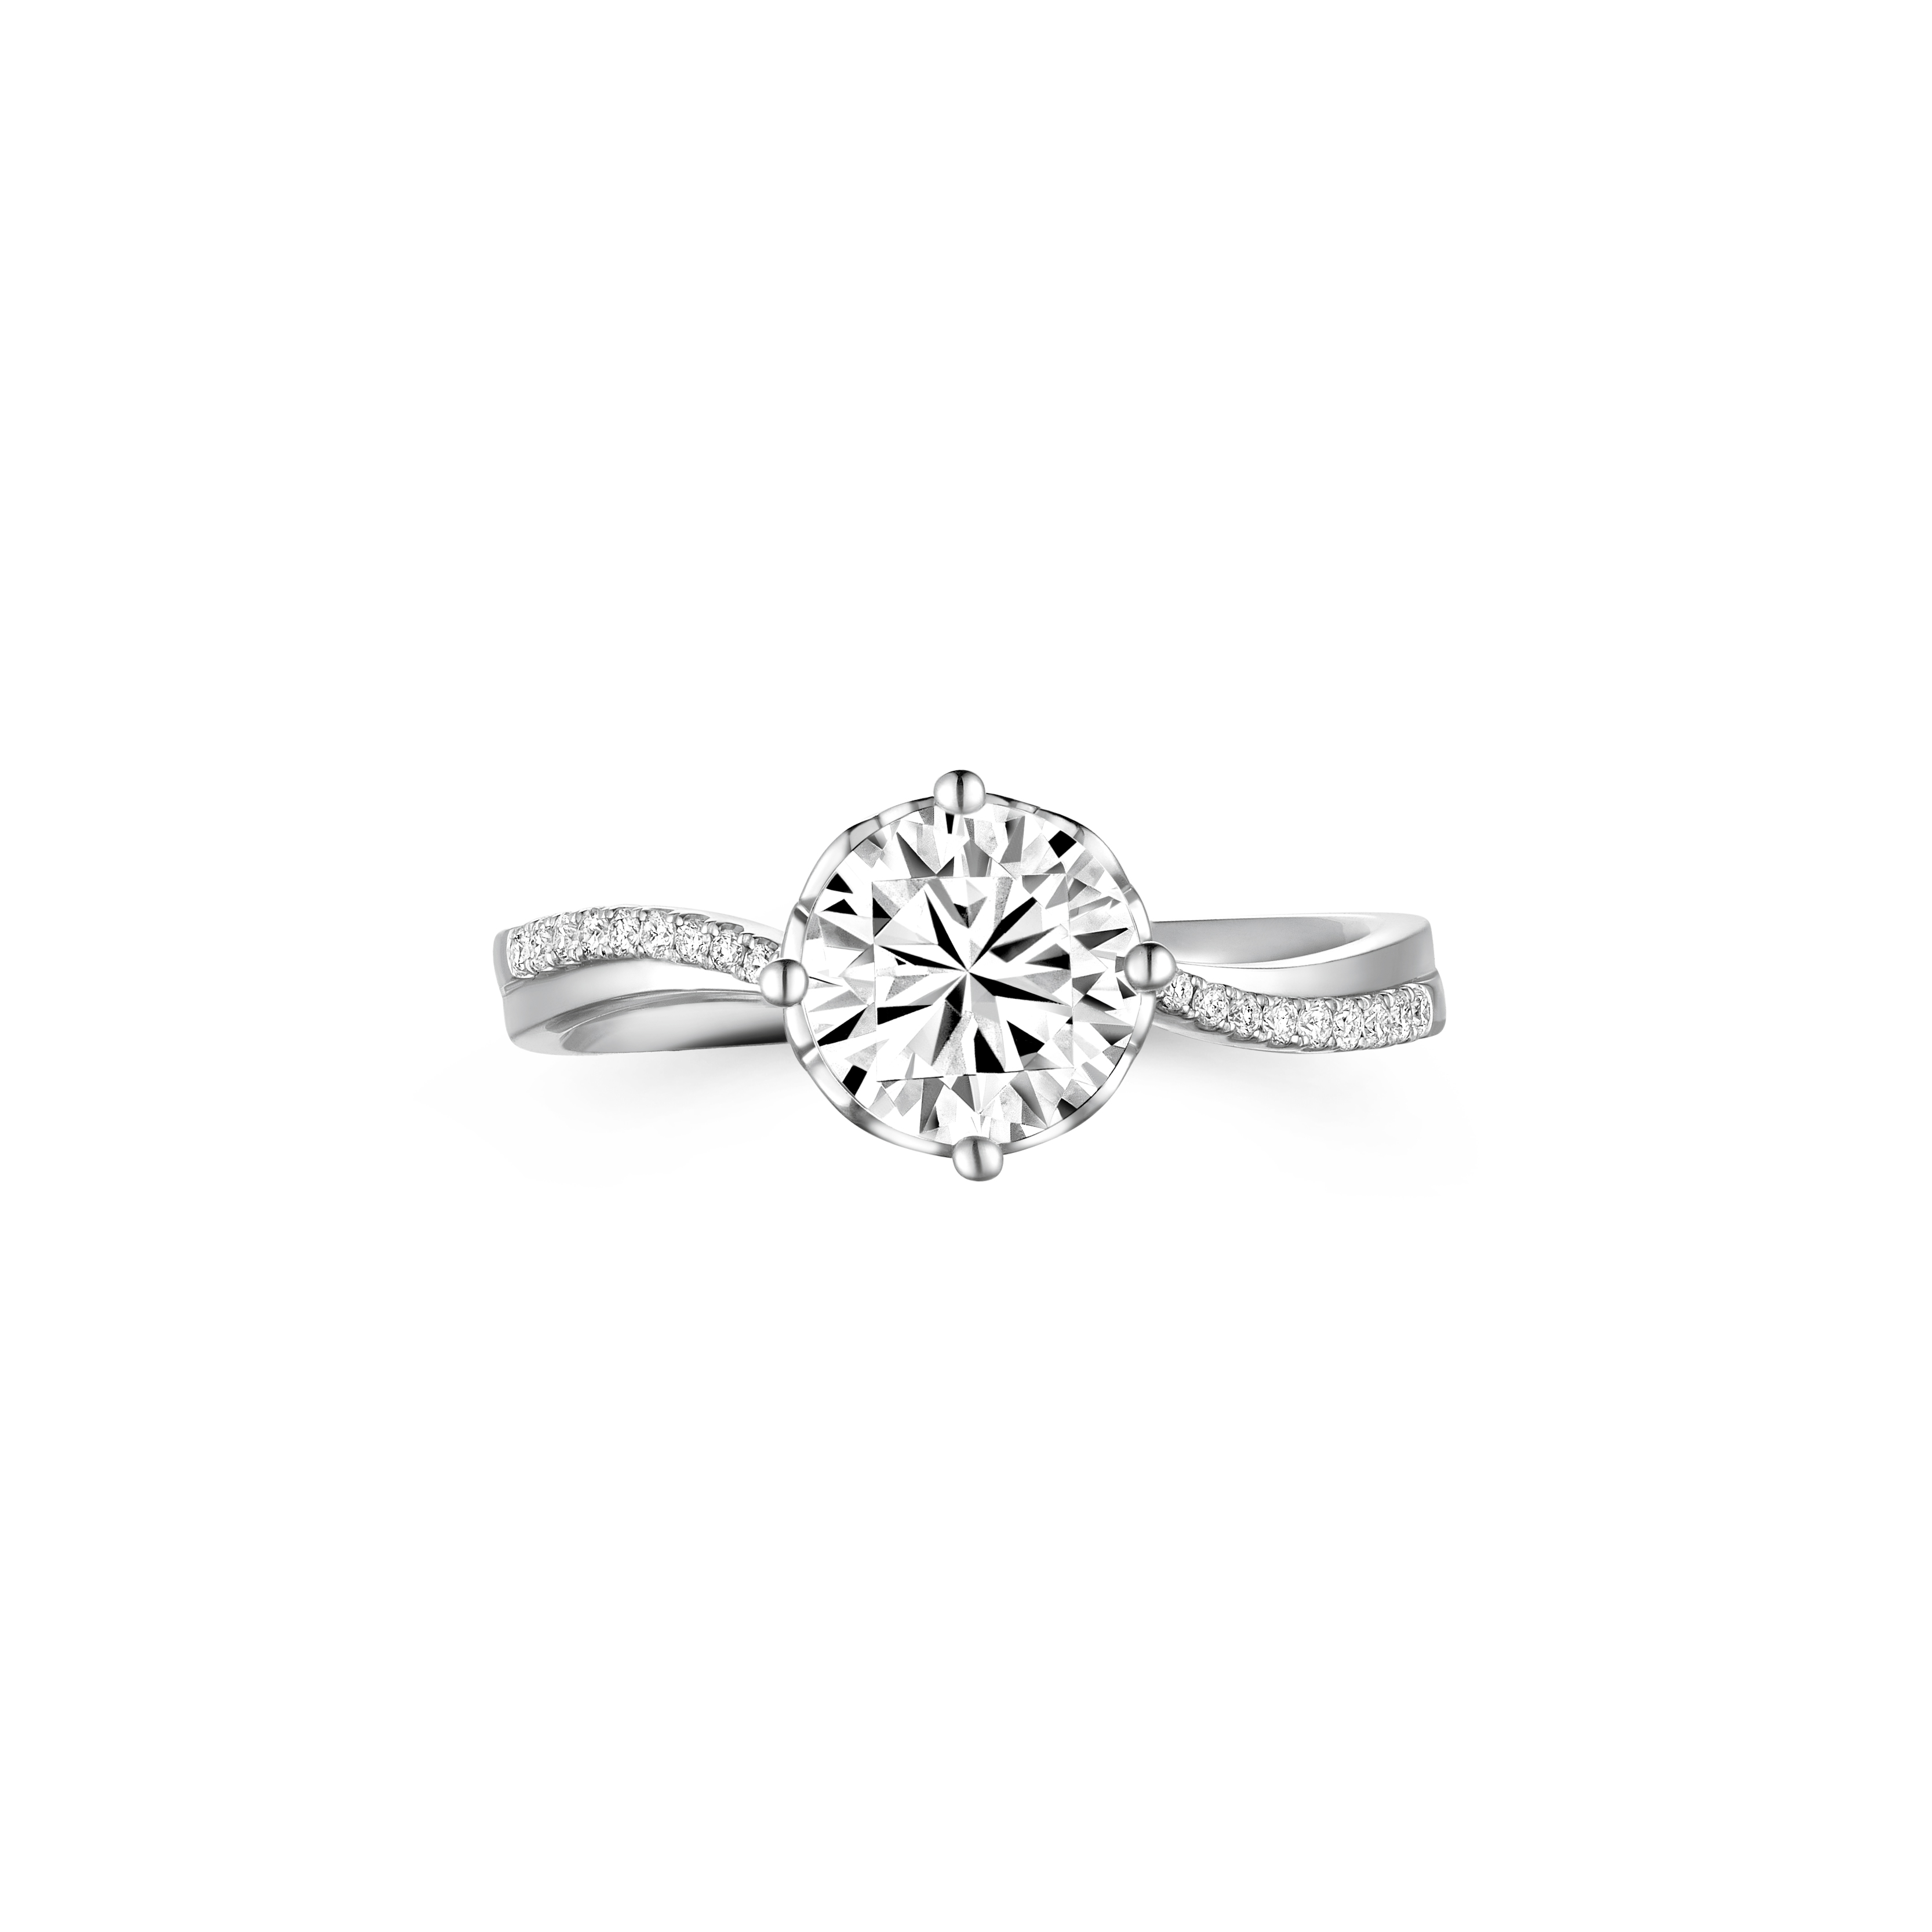 Wedding Collection 18K White Gold Diamond Ring